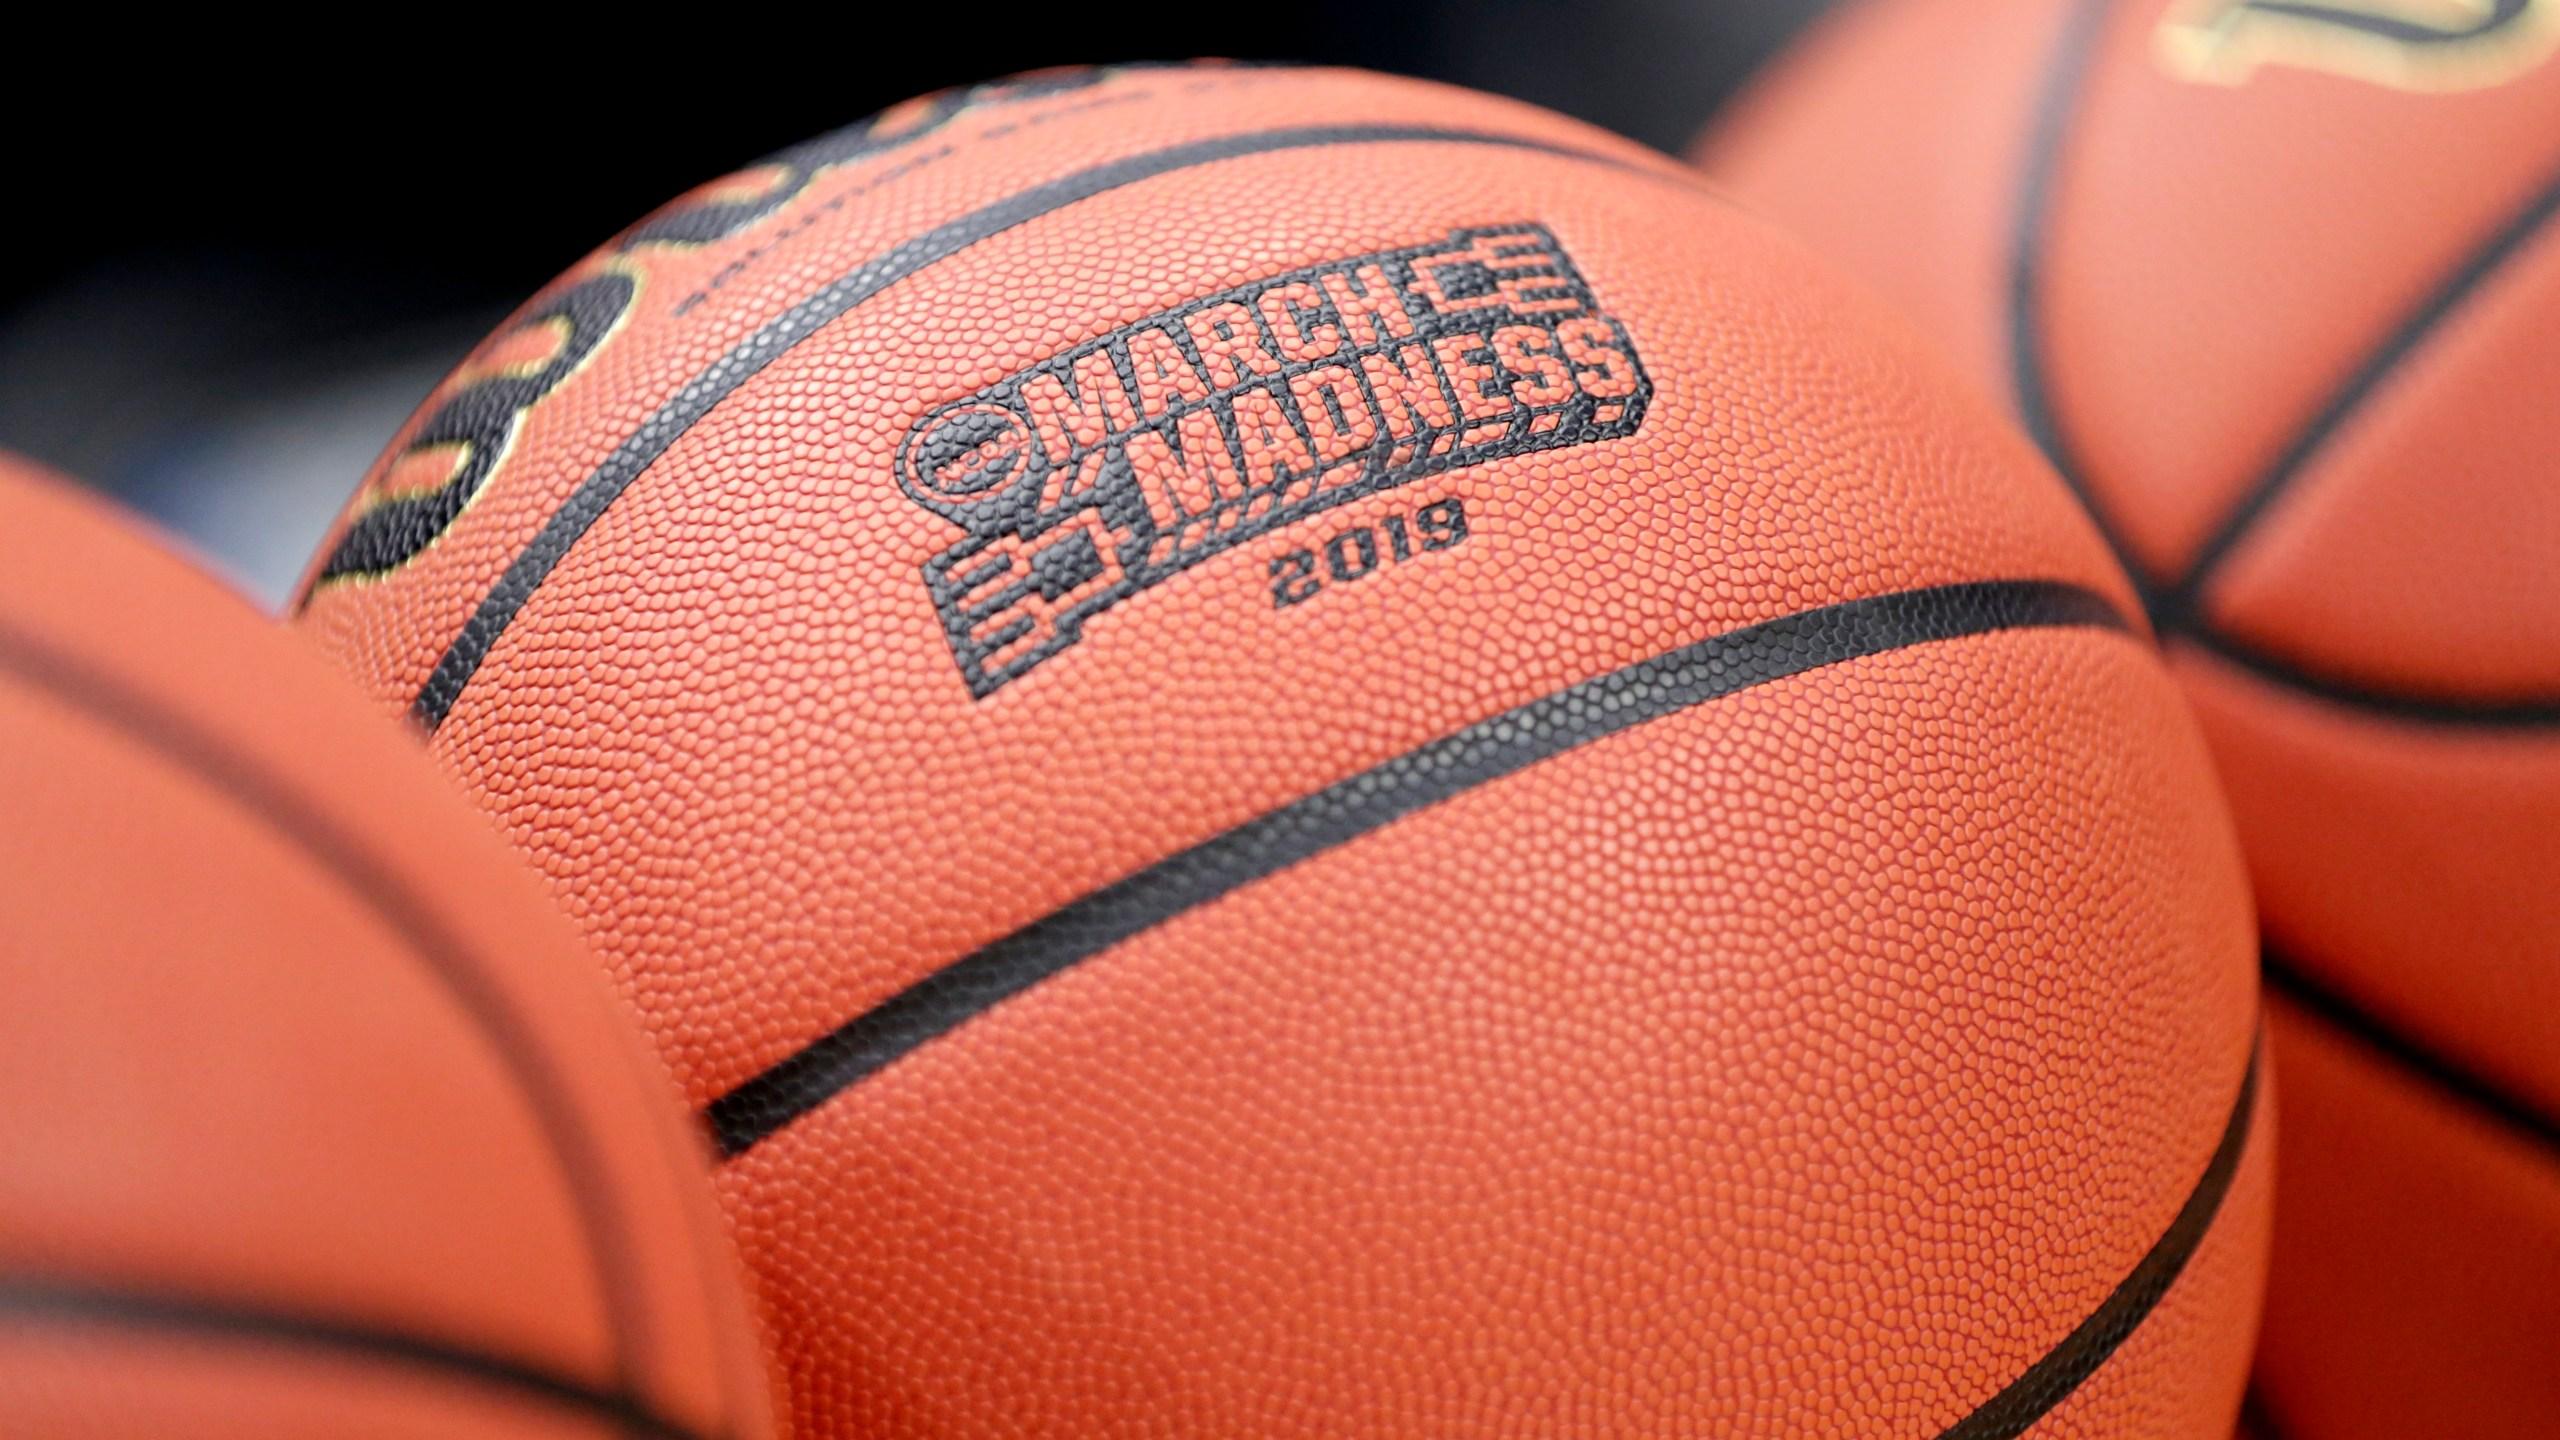 NCAA_March_Madness_Basketball_81558-159532.jpg77276380